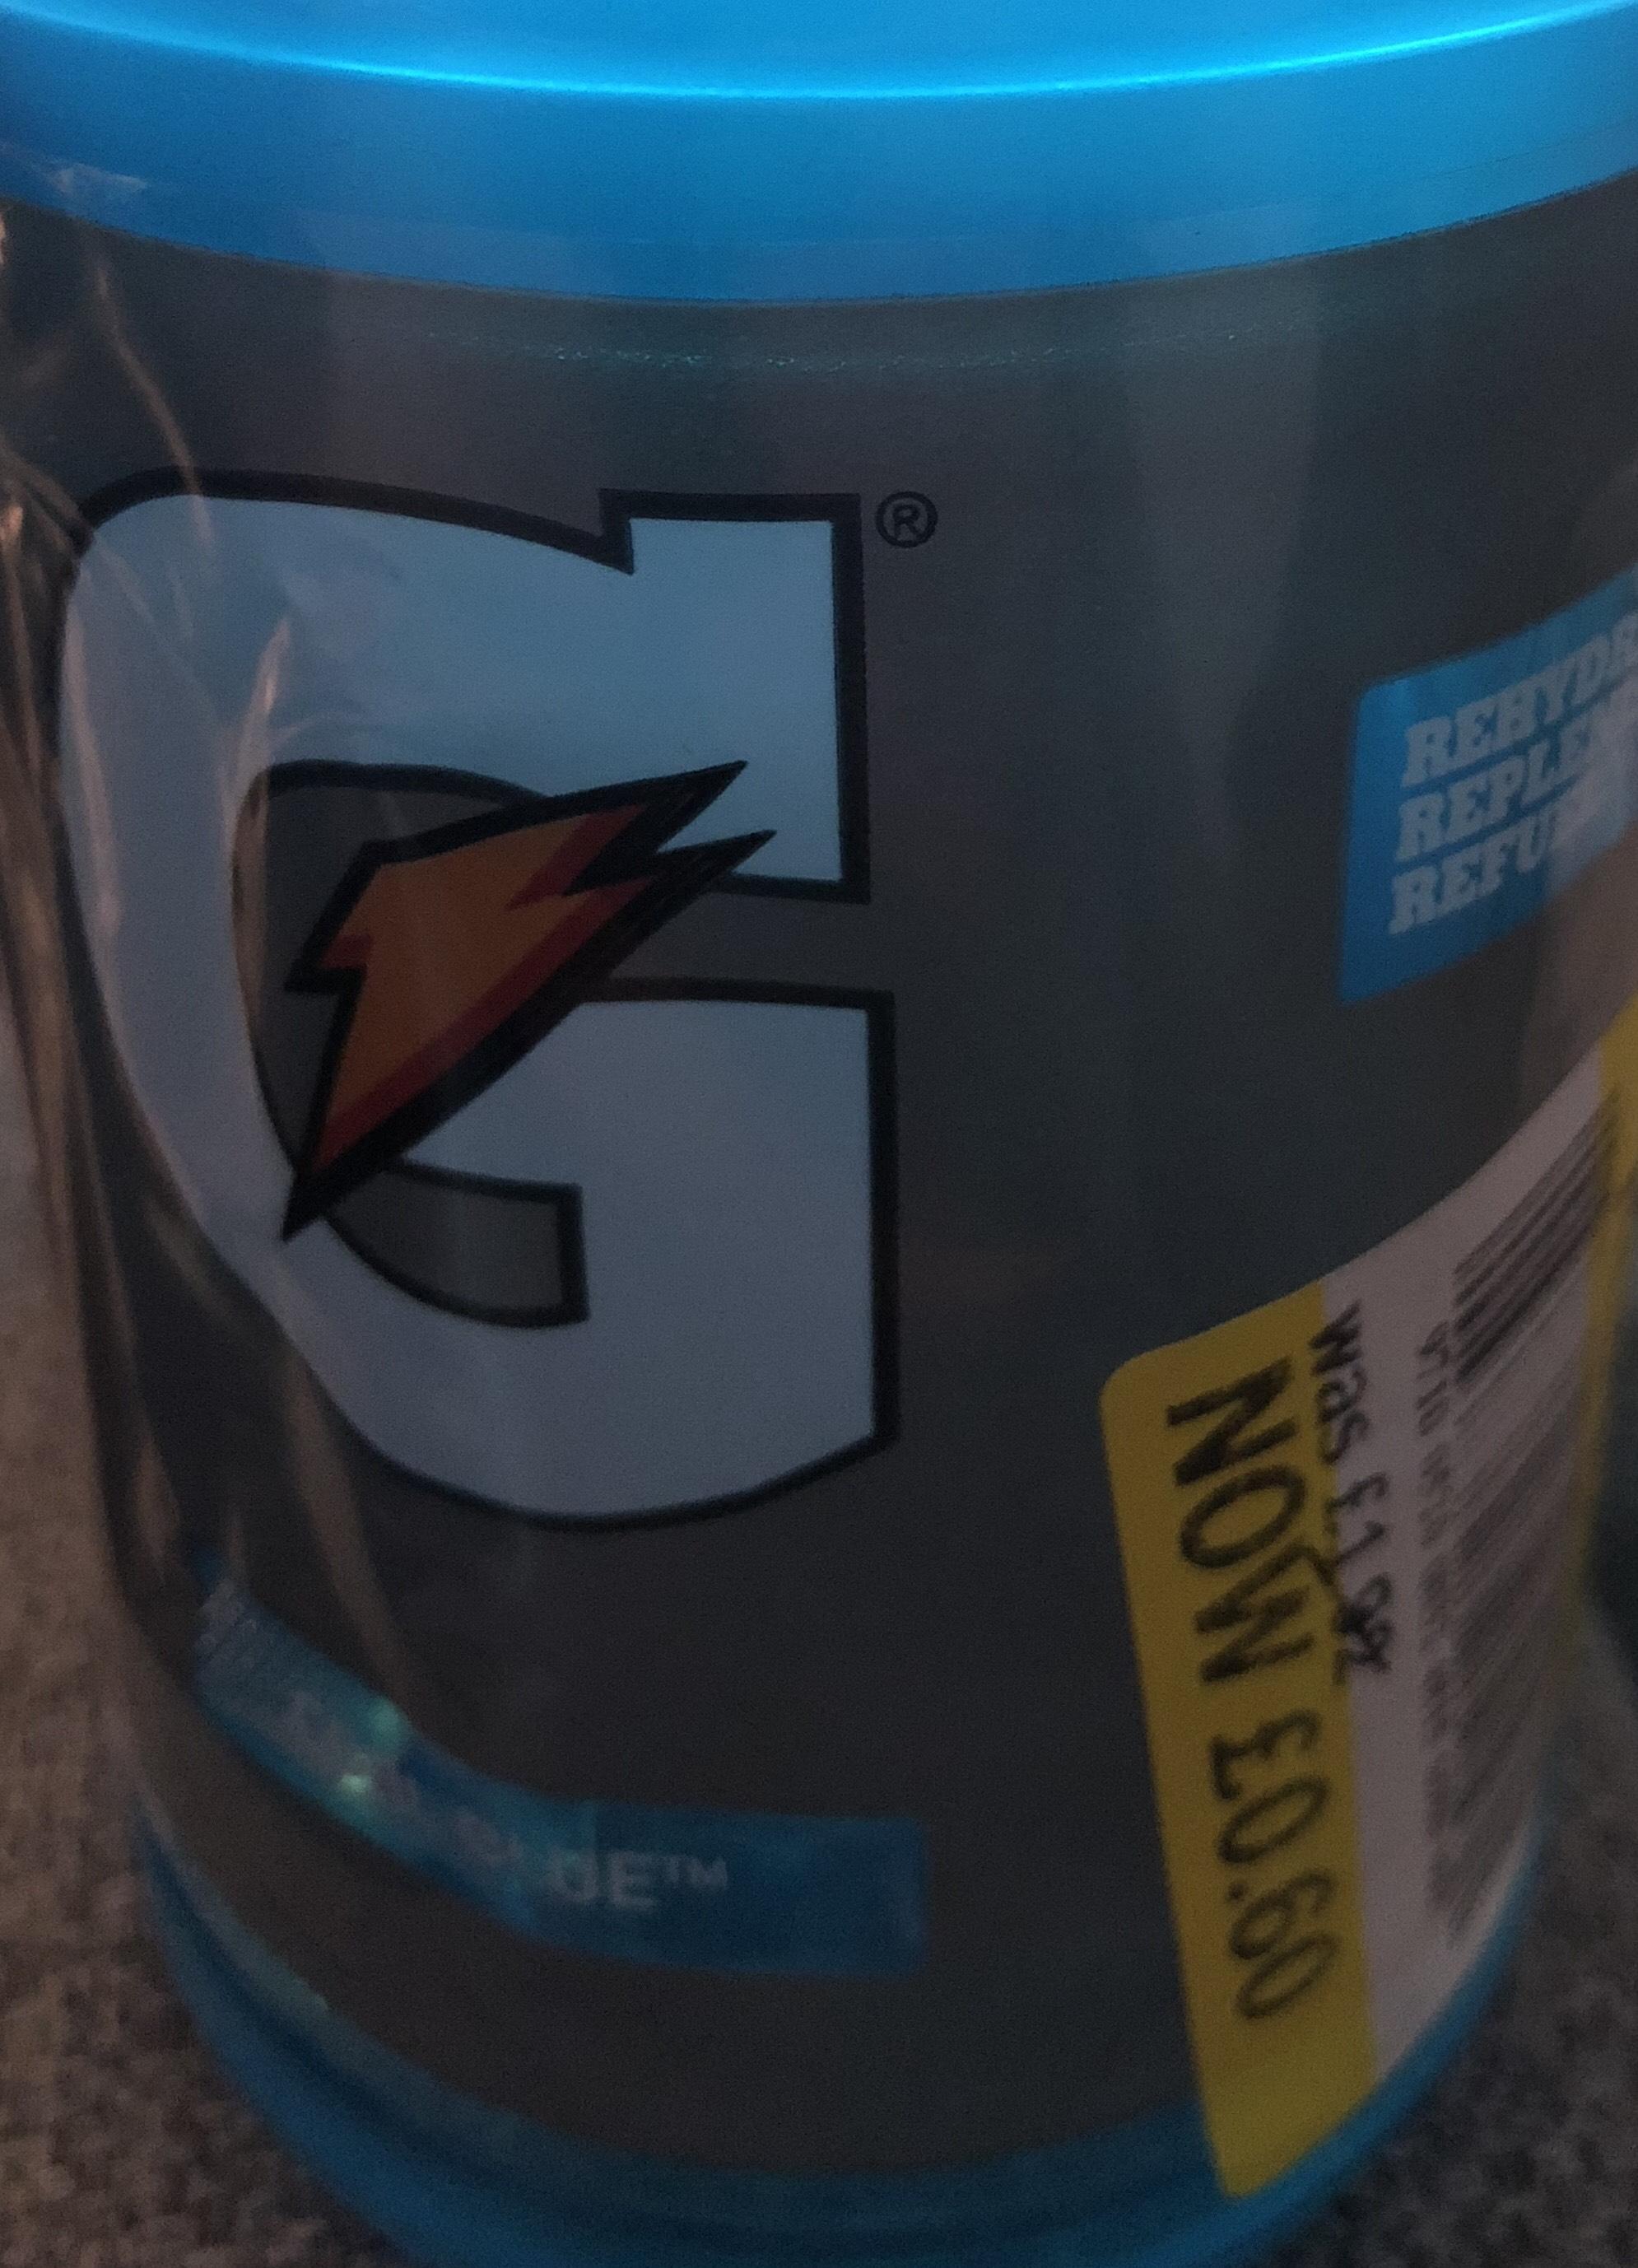 Gatorade Cool Blue 591ml - 60p @ Tesco (Local Luton)